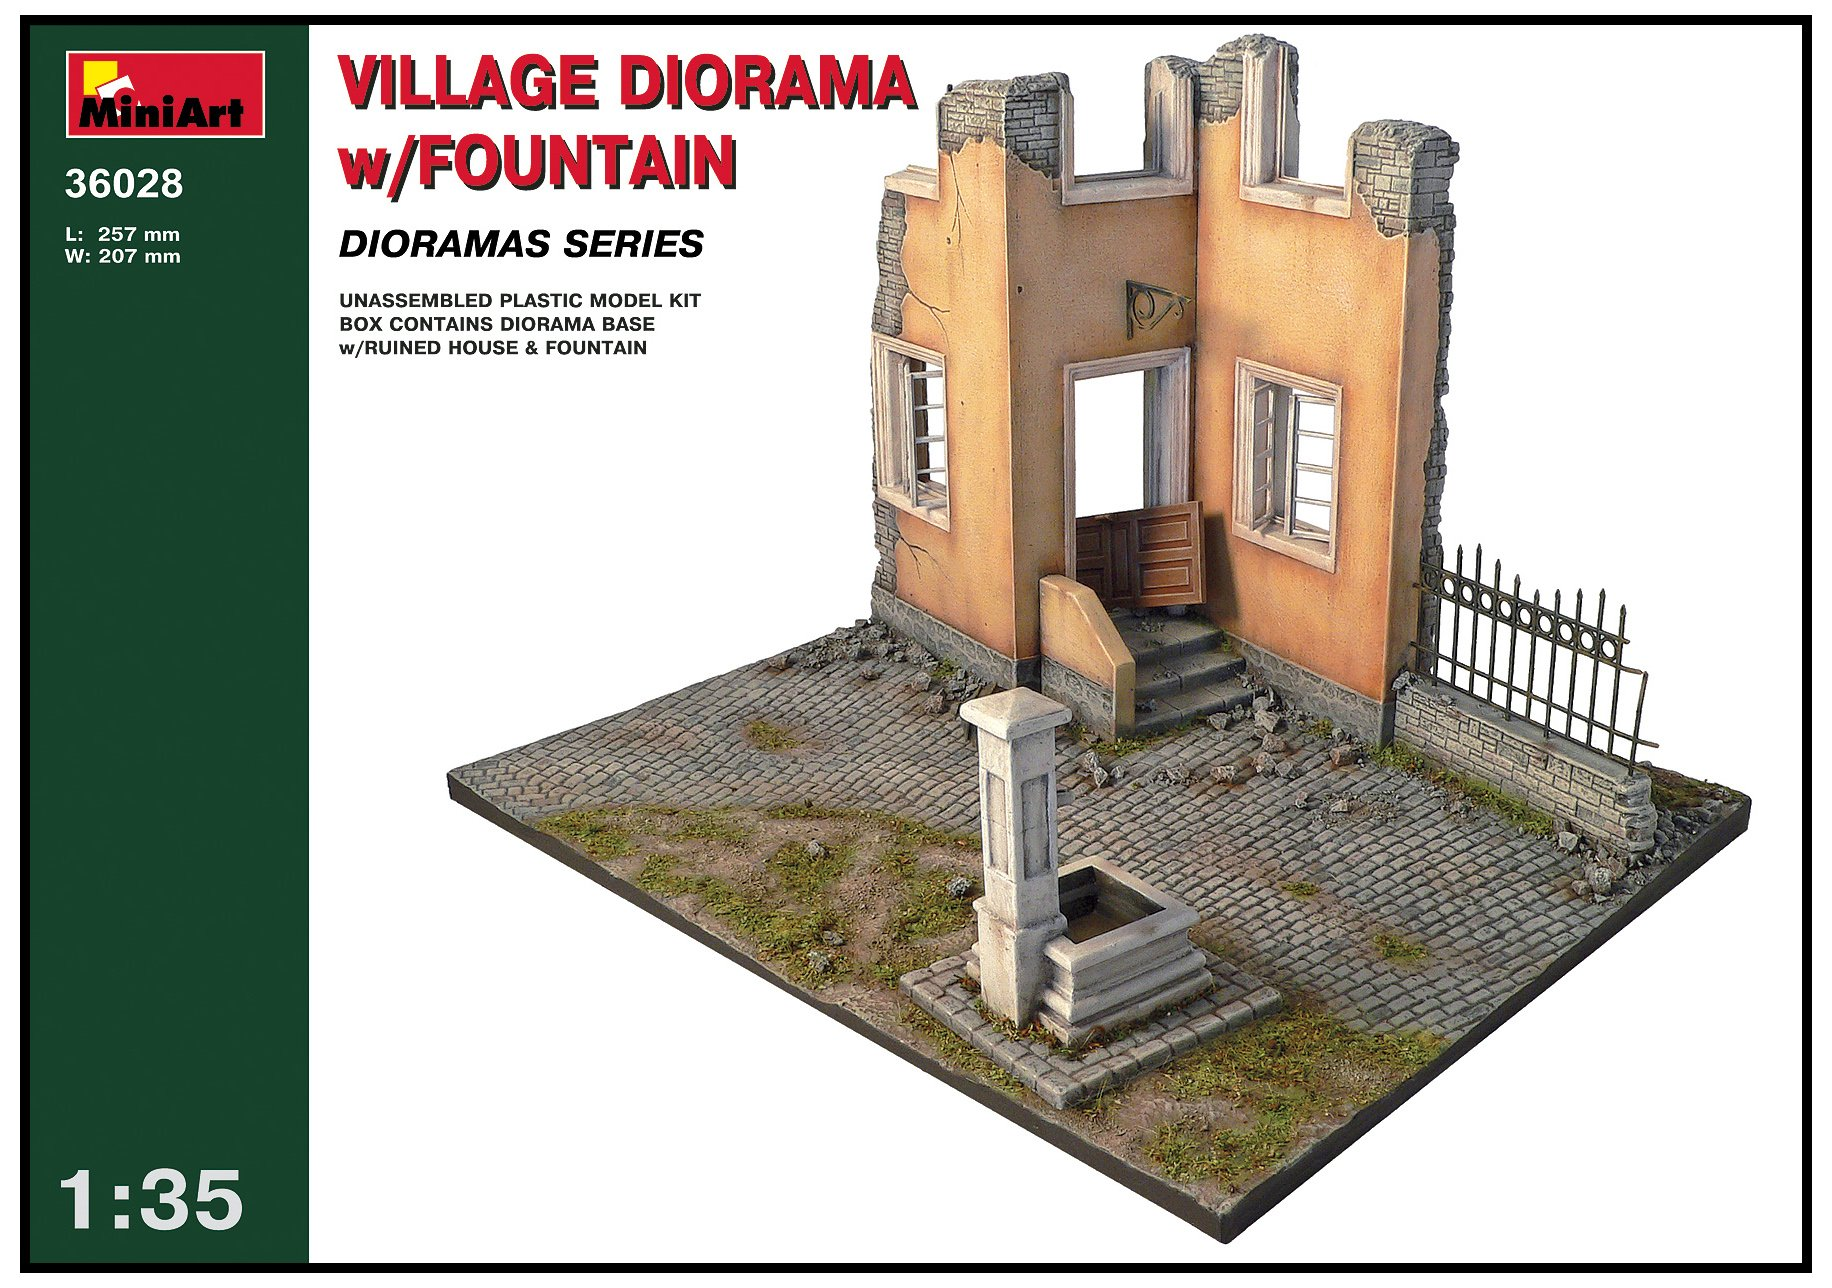 Miniart 1:35 - Village Dioramawith Fountain